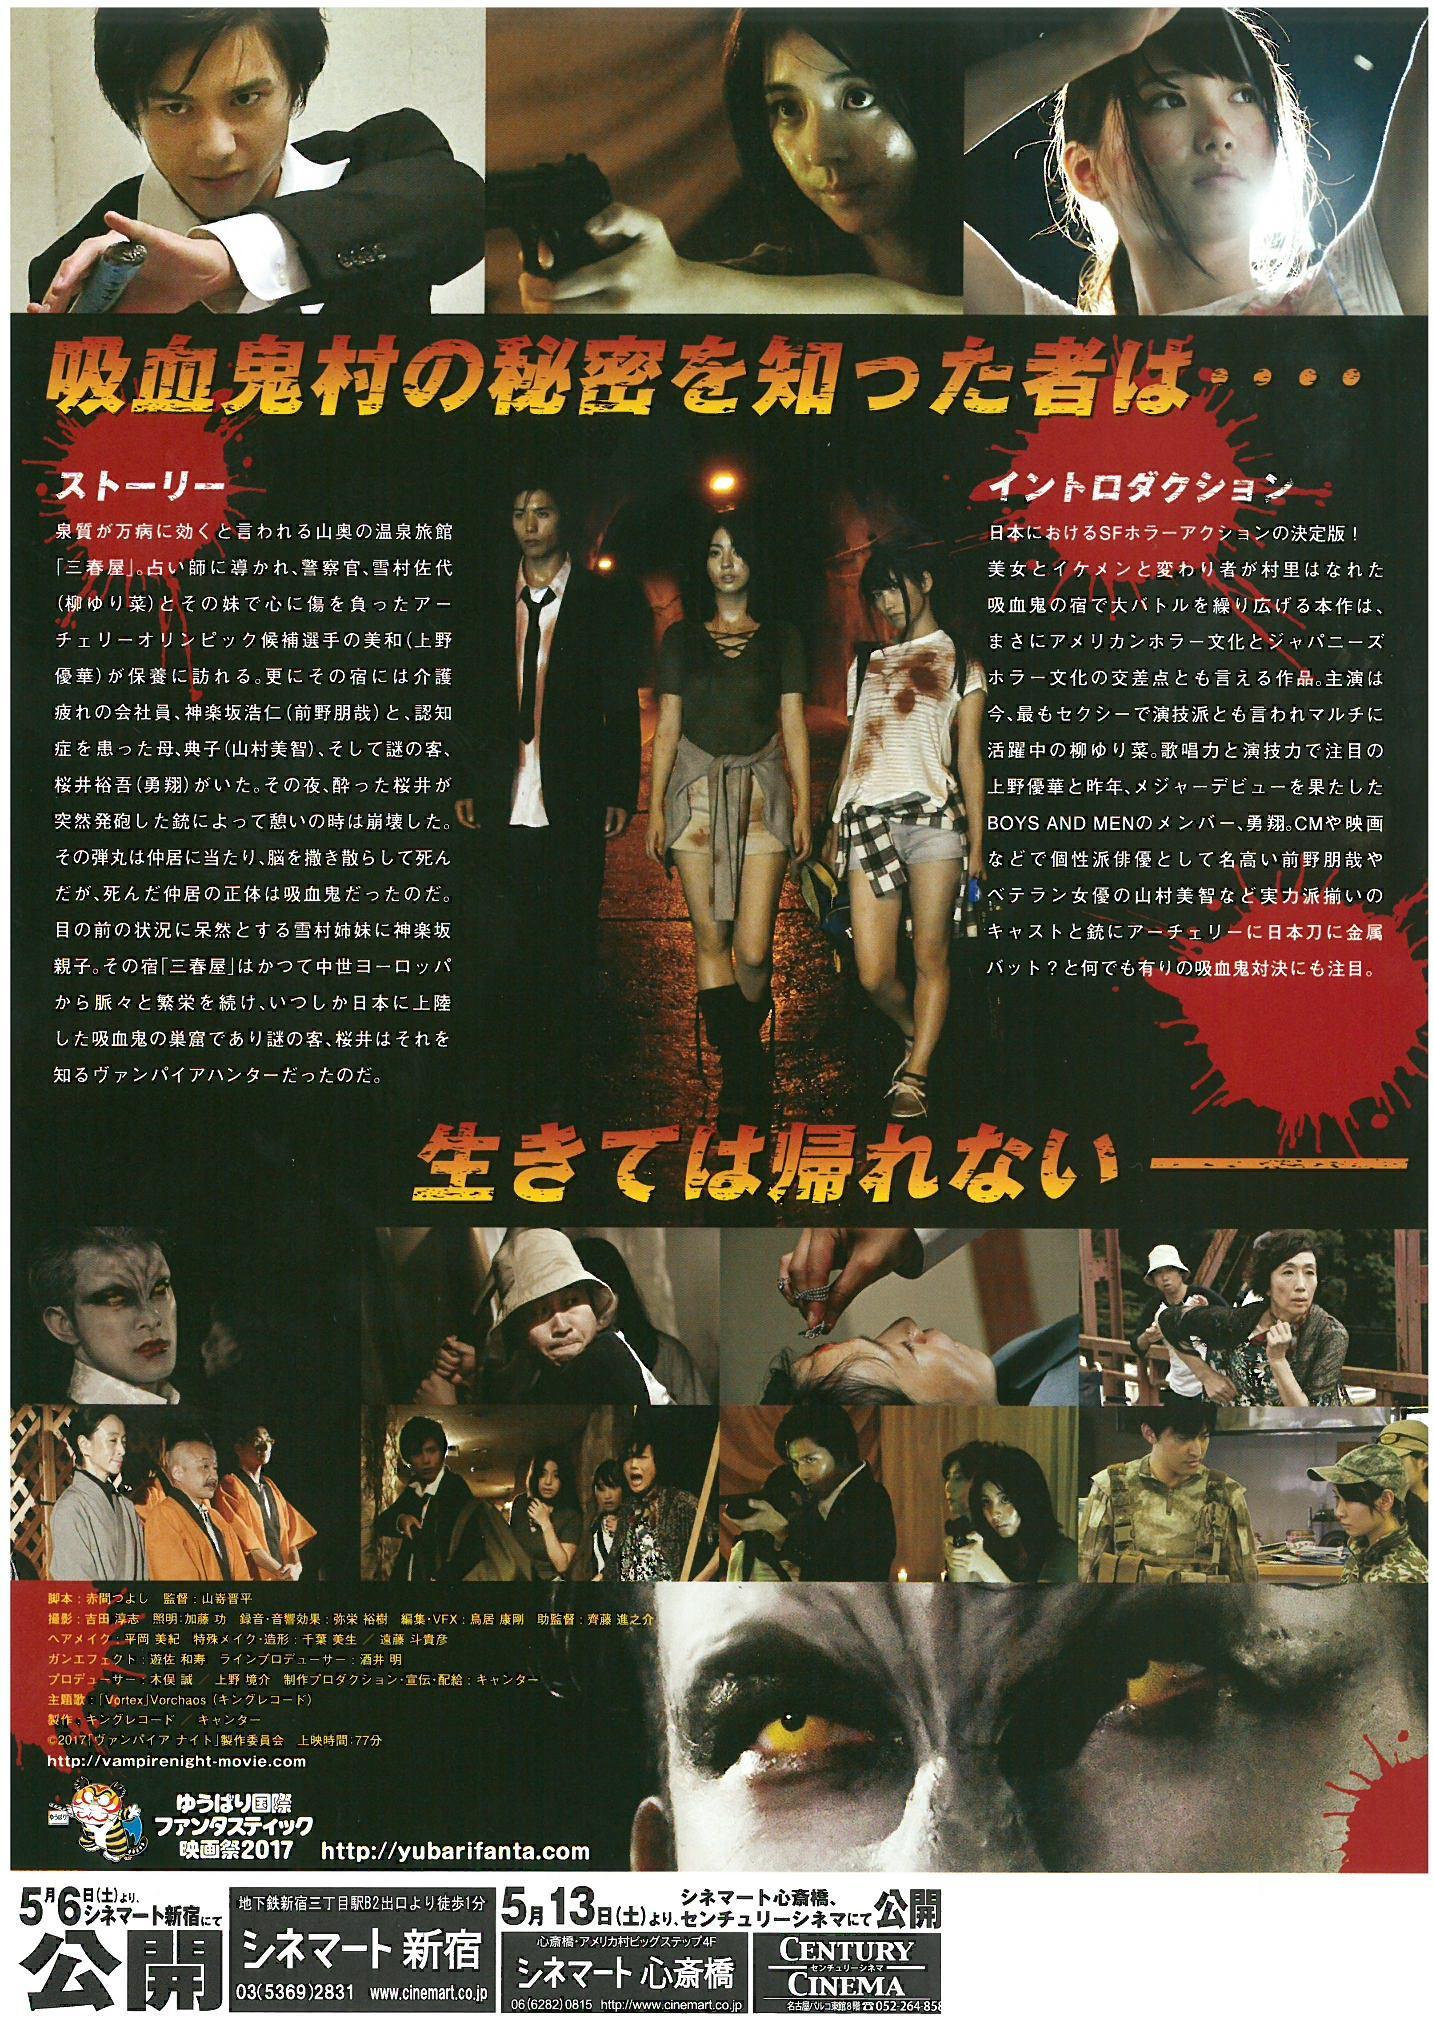 http://www.osu-koyukai.net/jimukyoku/f56e1bfdecfd5bbc7da8e650aee81a29c568256e.jpg